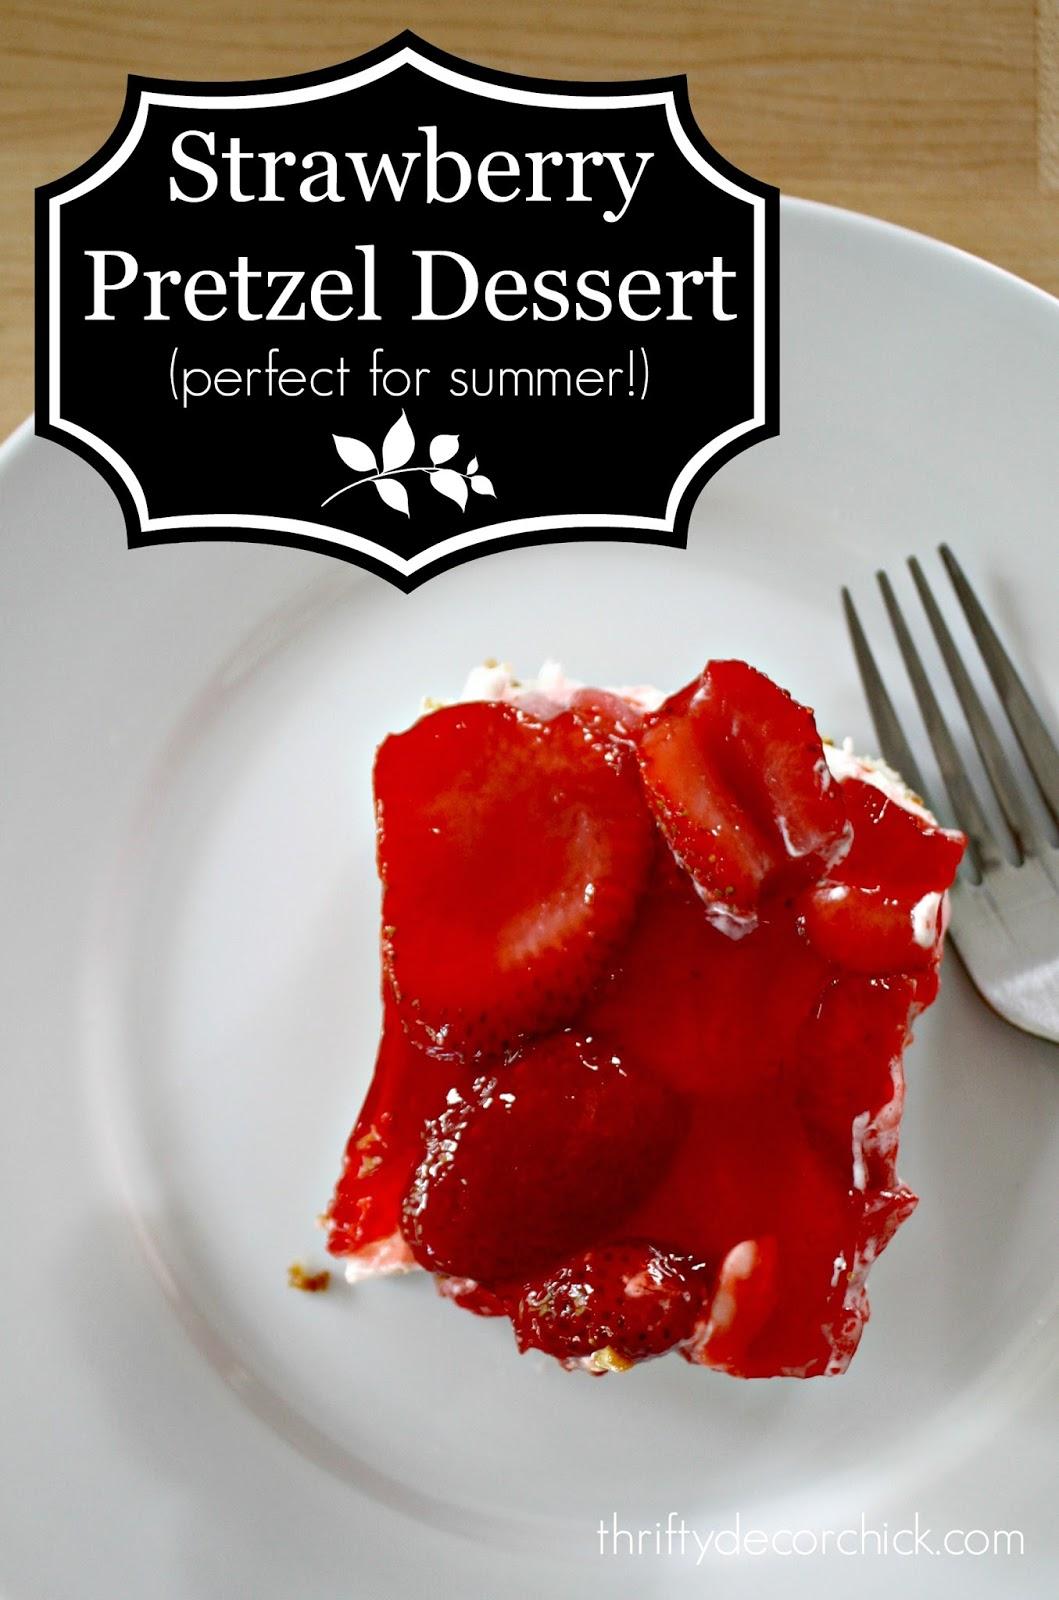 Strawberry cream cheese and pretzel dessert